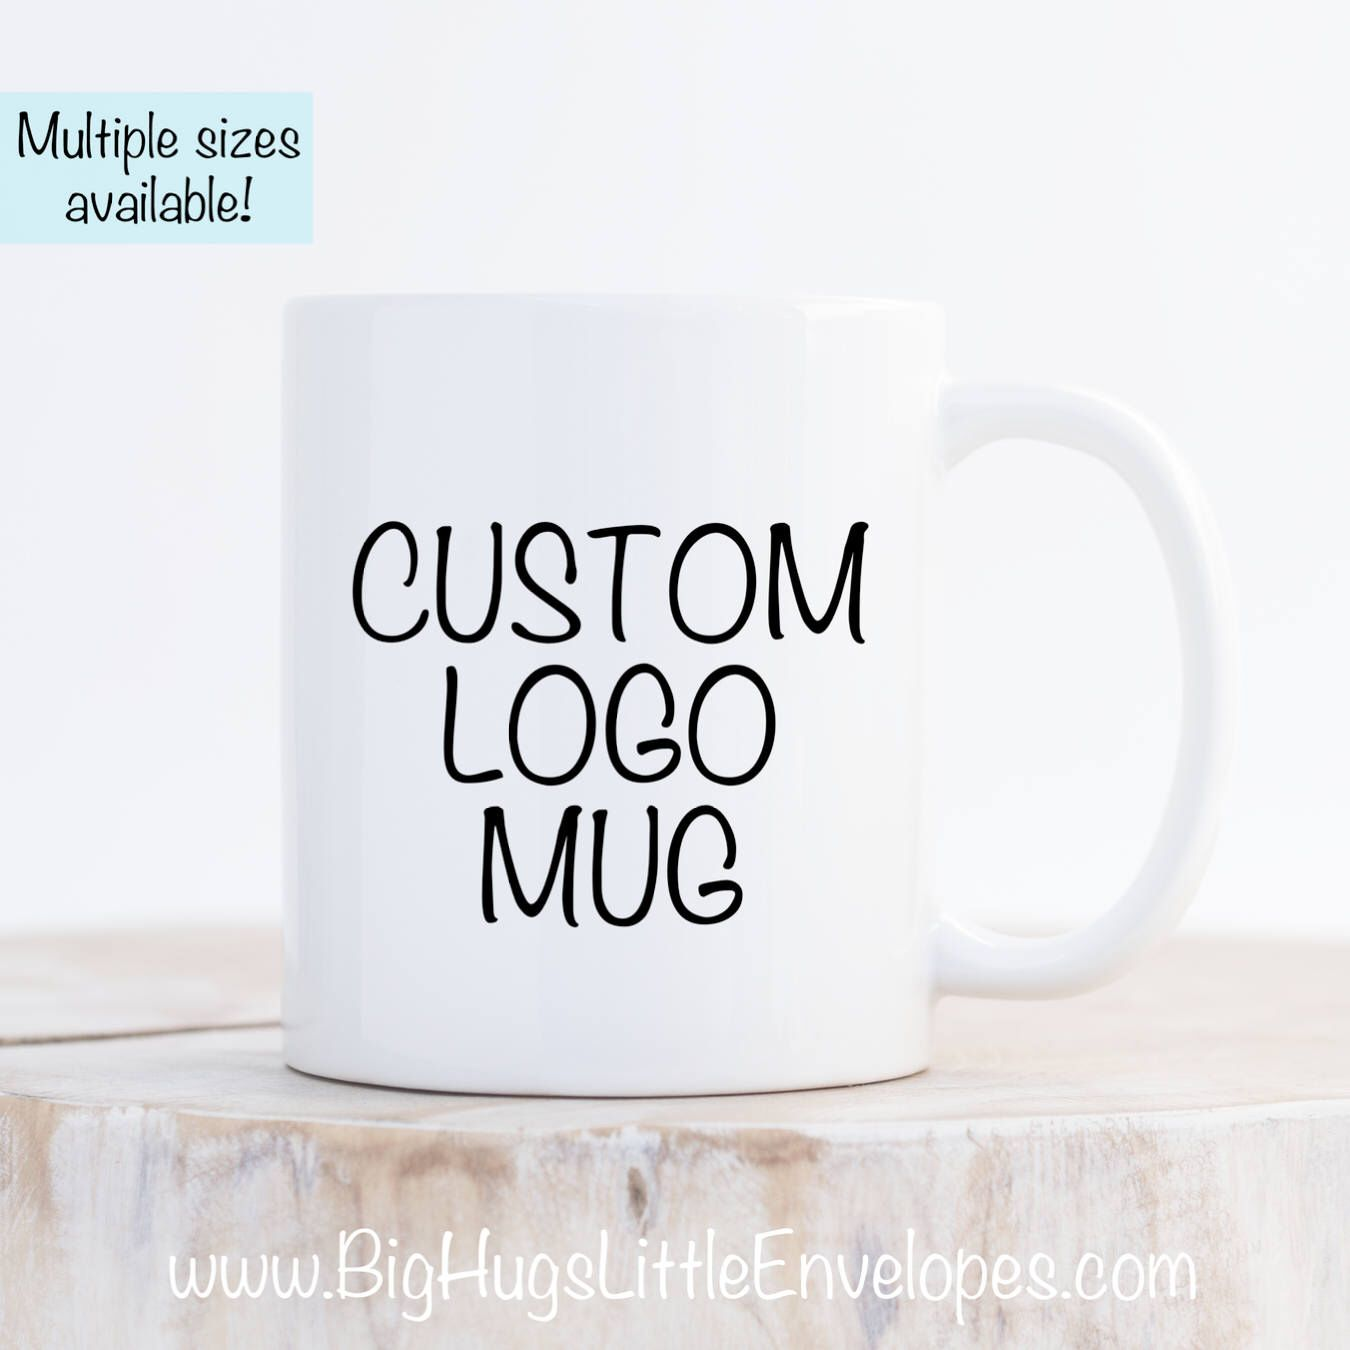 custom logo mug design your own mug your logo here coffee mug coffee cup tea cup travel mug latte mug small business maker